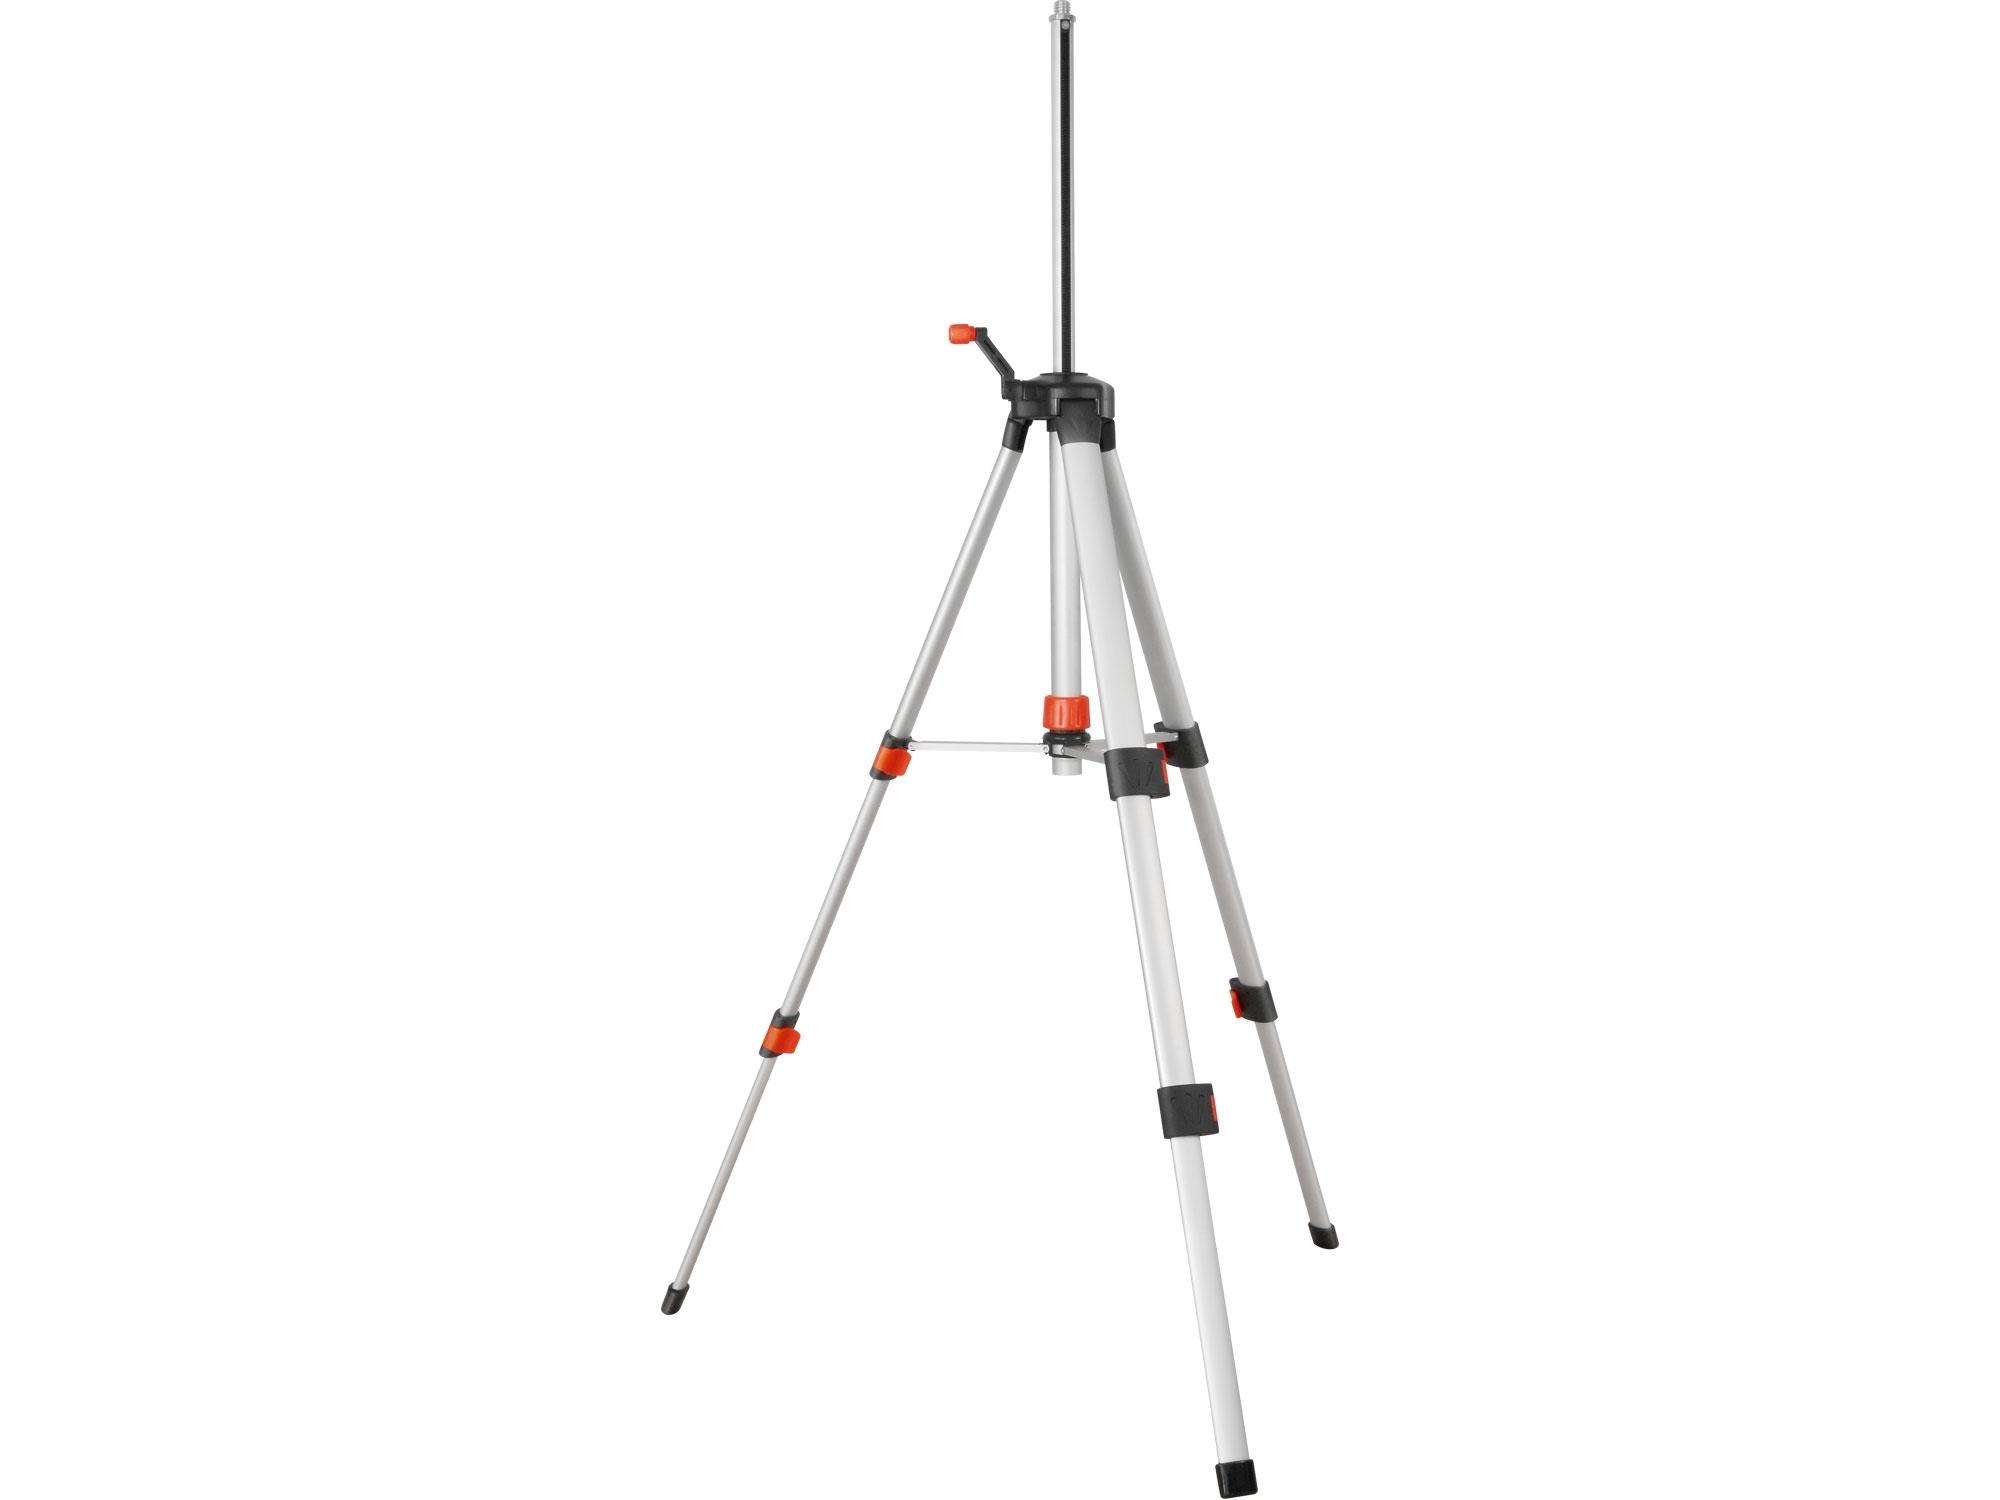 stativ výsuvný, 420-1200mm, EXTOL PREMIUM 8823900